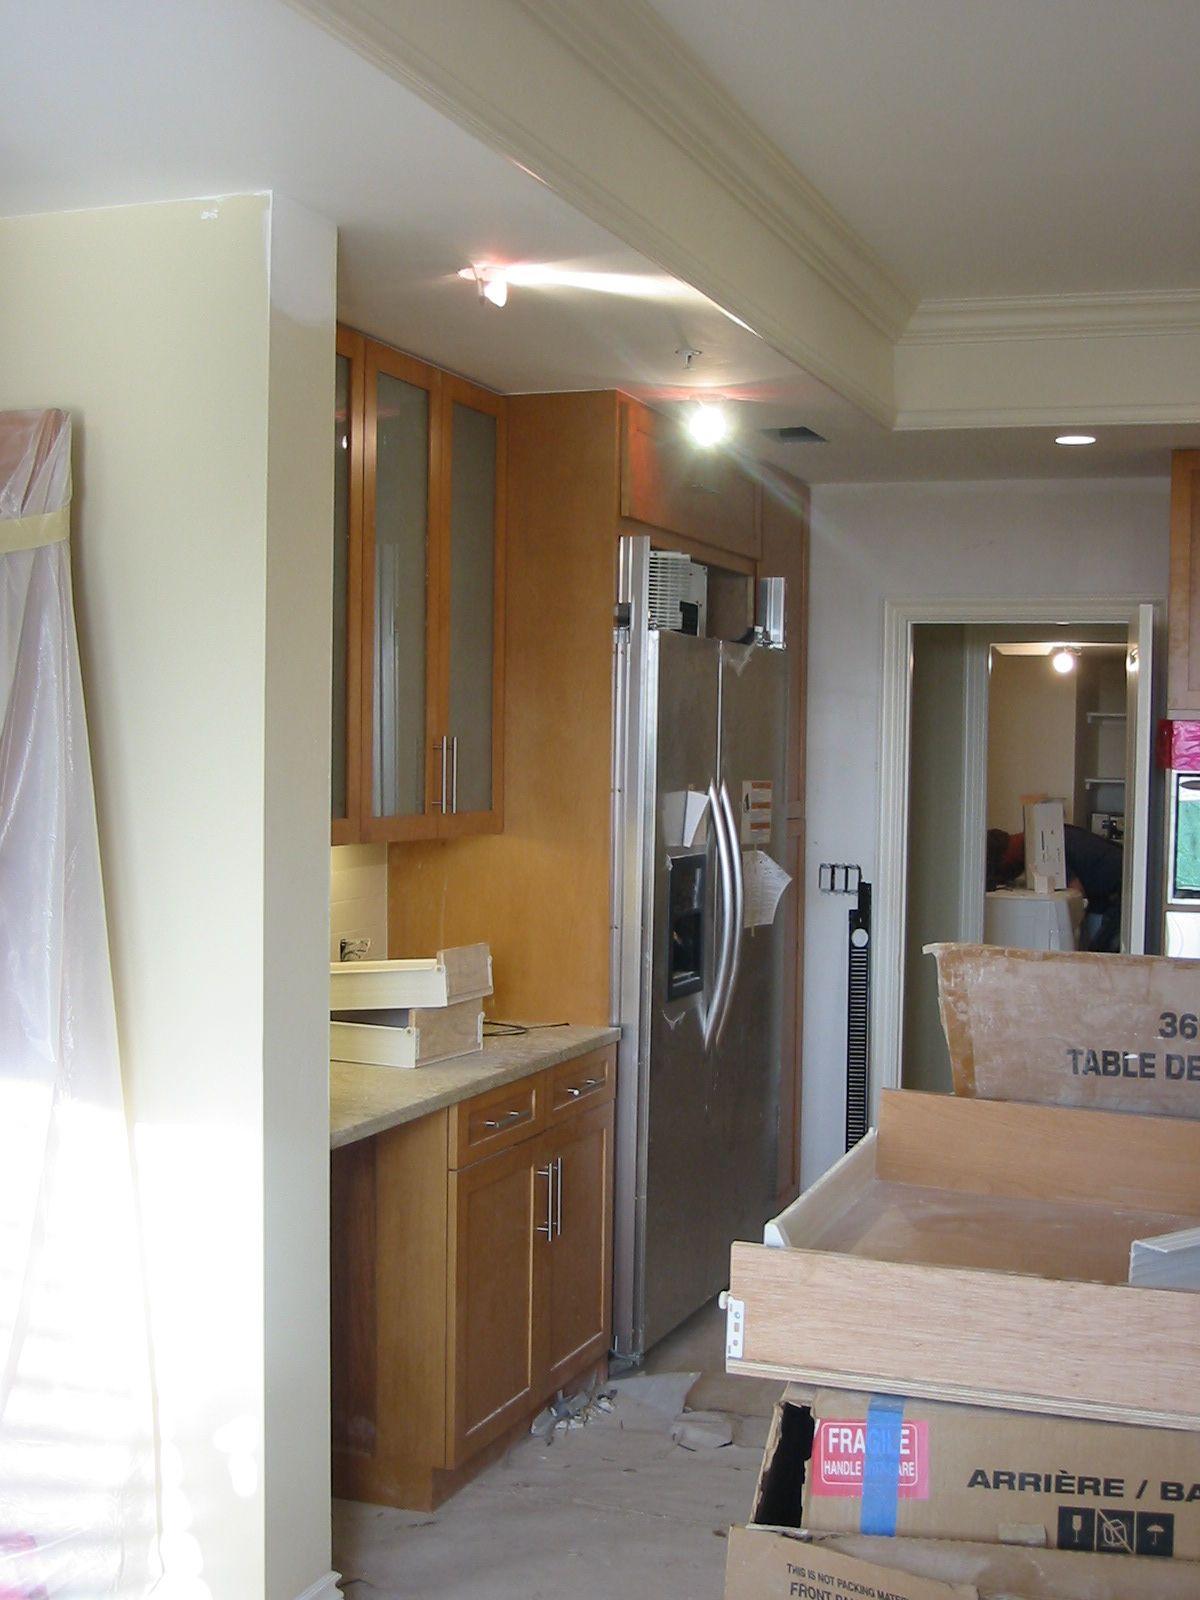 Kitchens-132.jpg